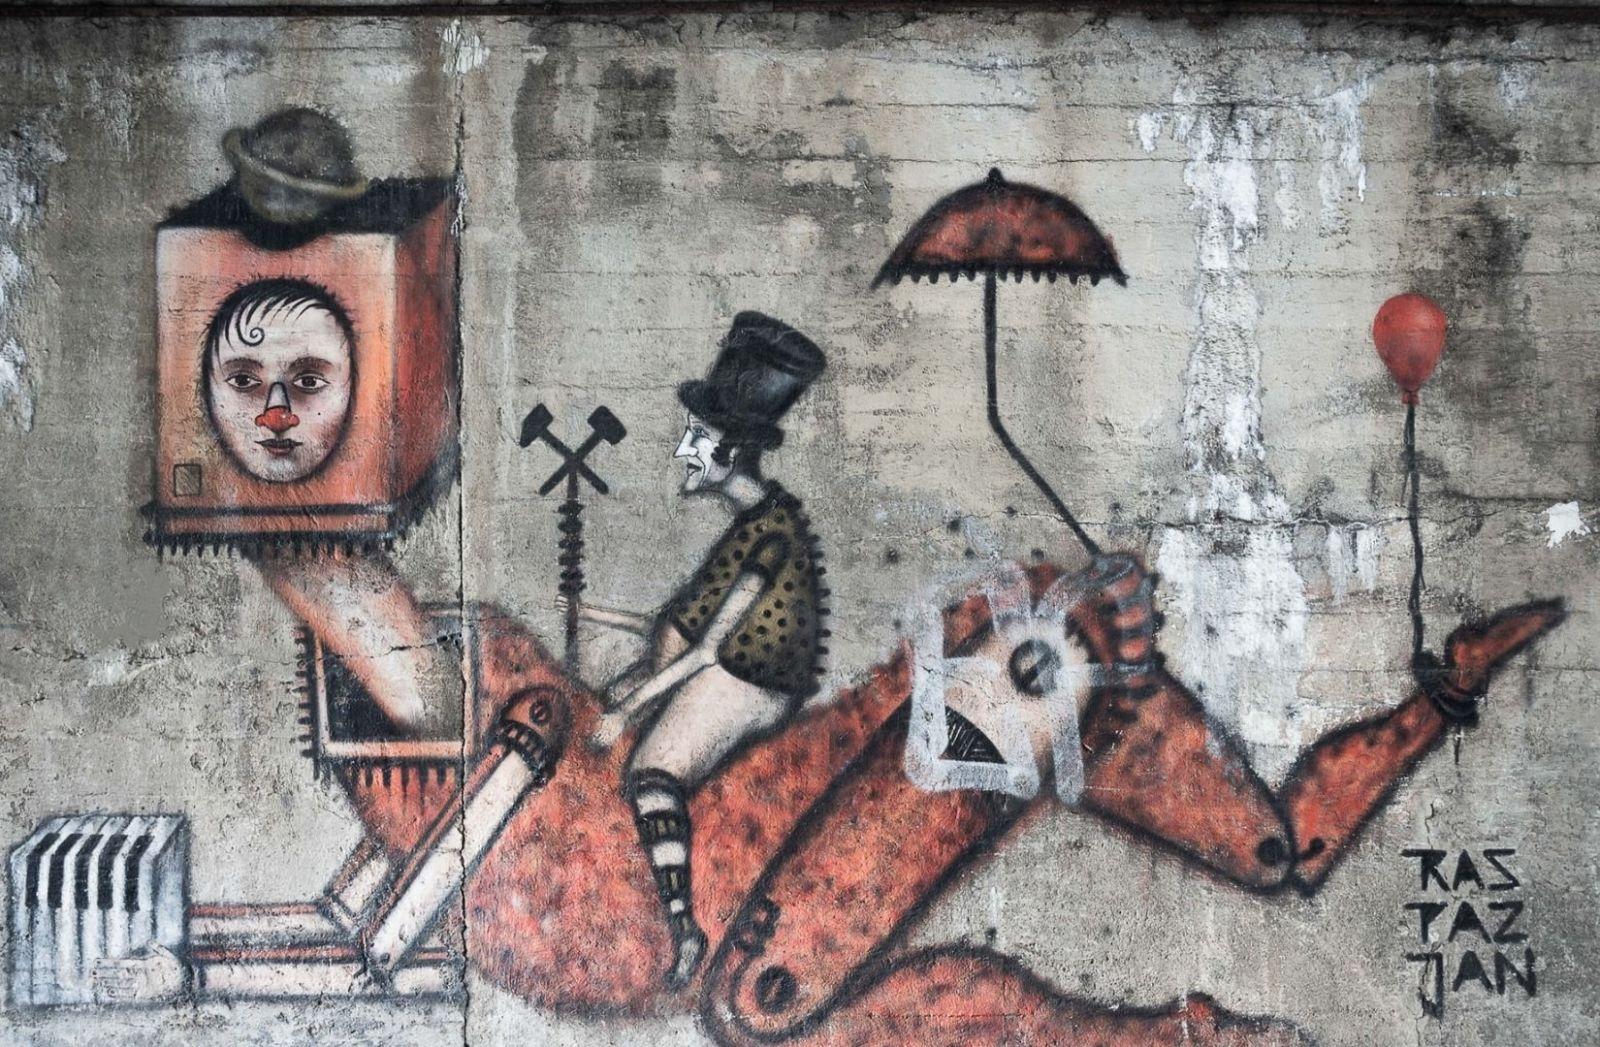 Wie sieht die Zukunft aus. Street Art in Polen. (Foto: Pawel Czerwinski, Unsplash.com)